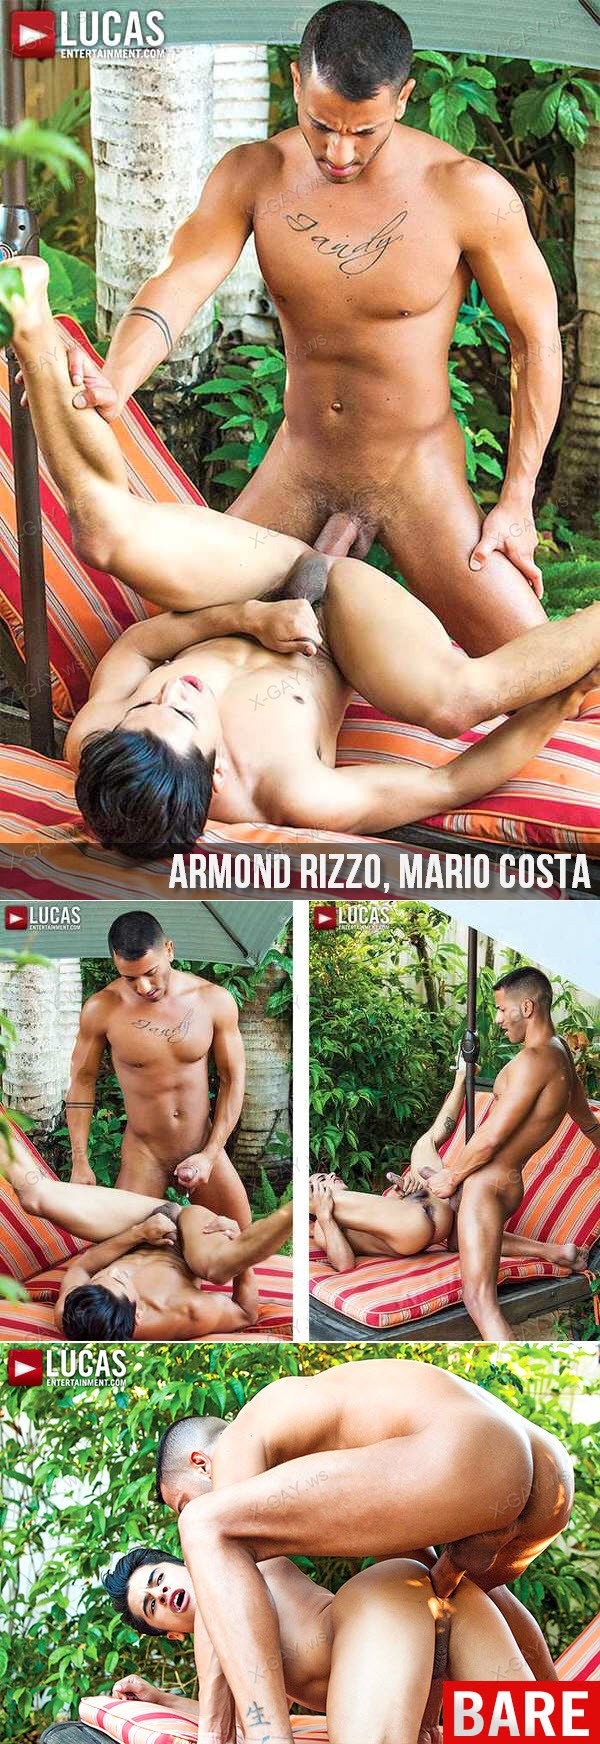 LucasEntertainment: Armond Rizzo Bottoms For Mario Costa's Raw Uncut Latin Cock